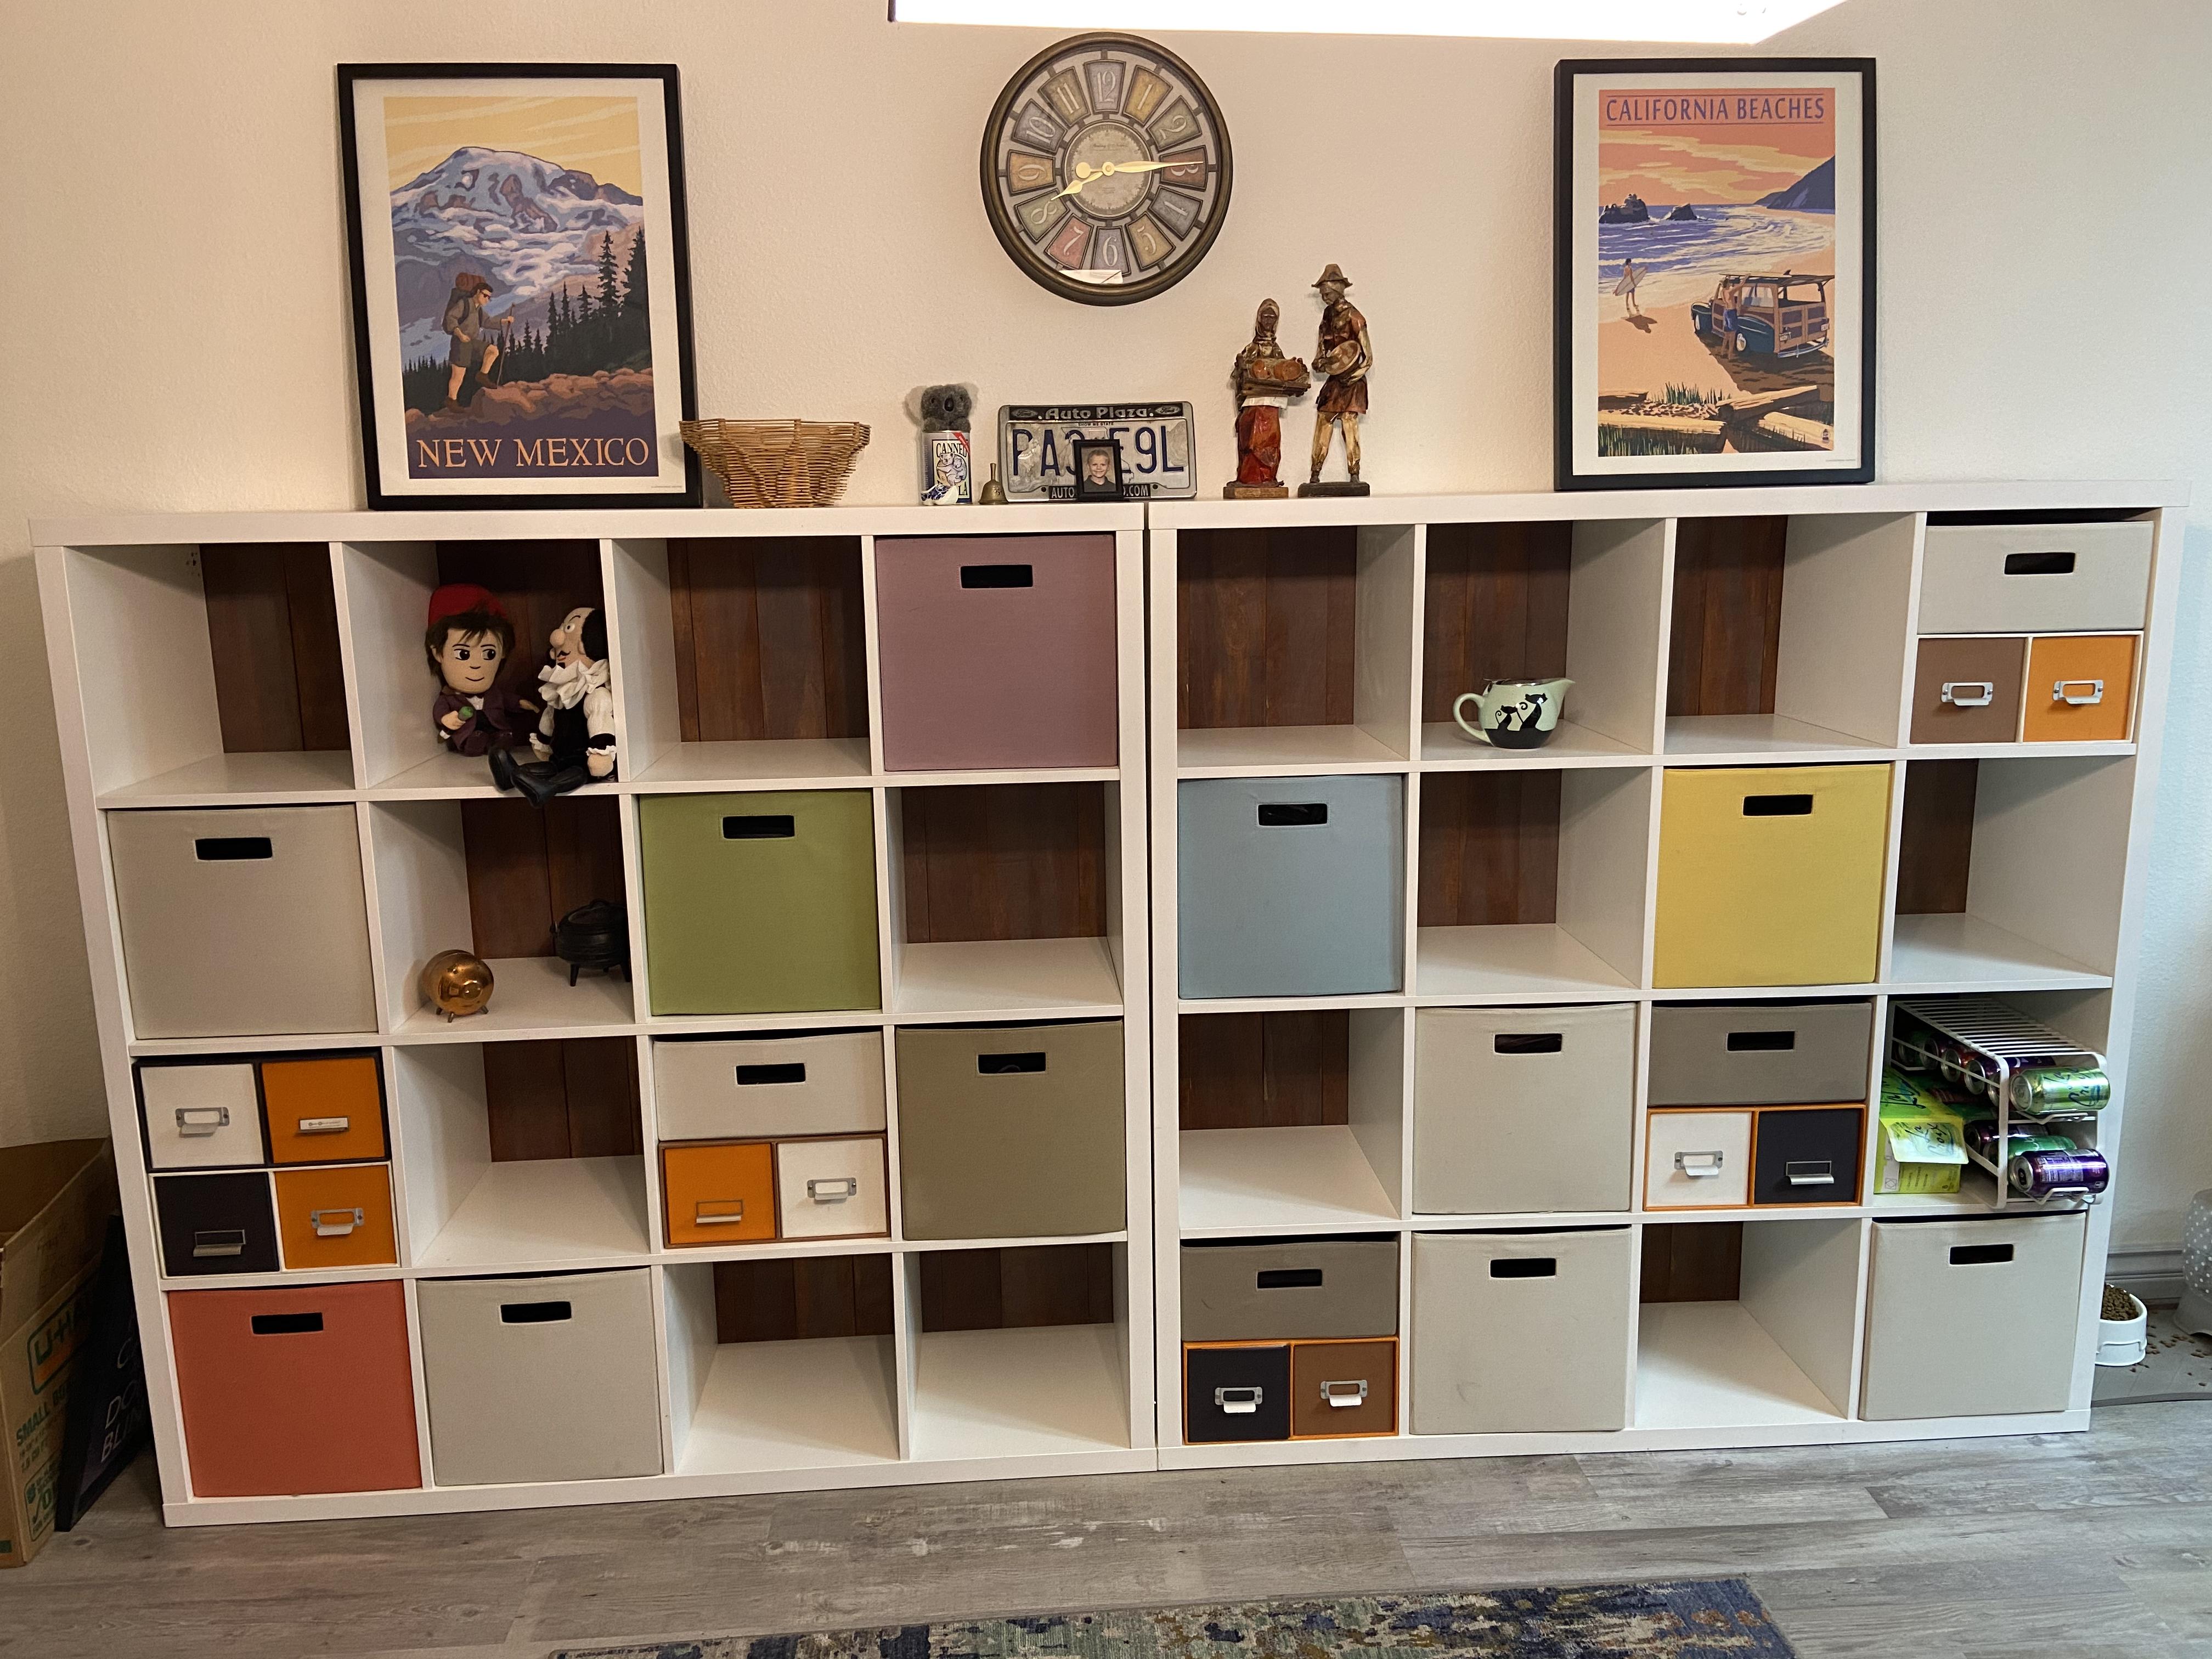 wood panels supporting an Ikea shelving unit